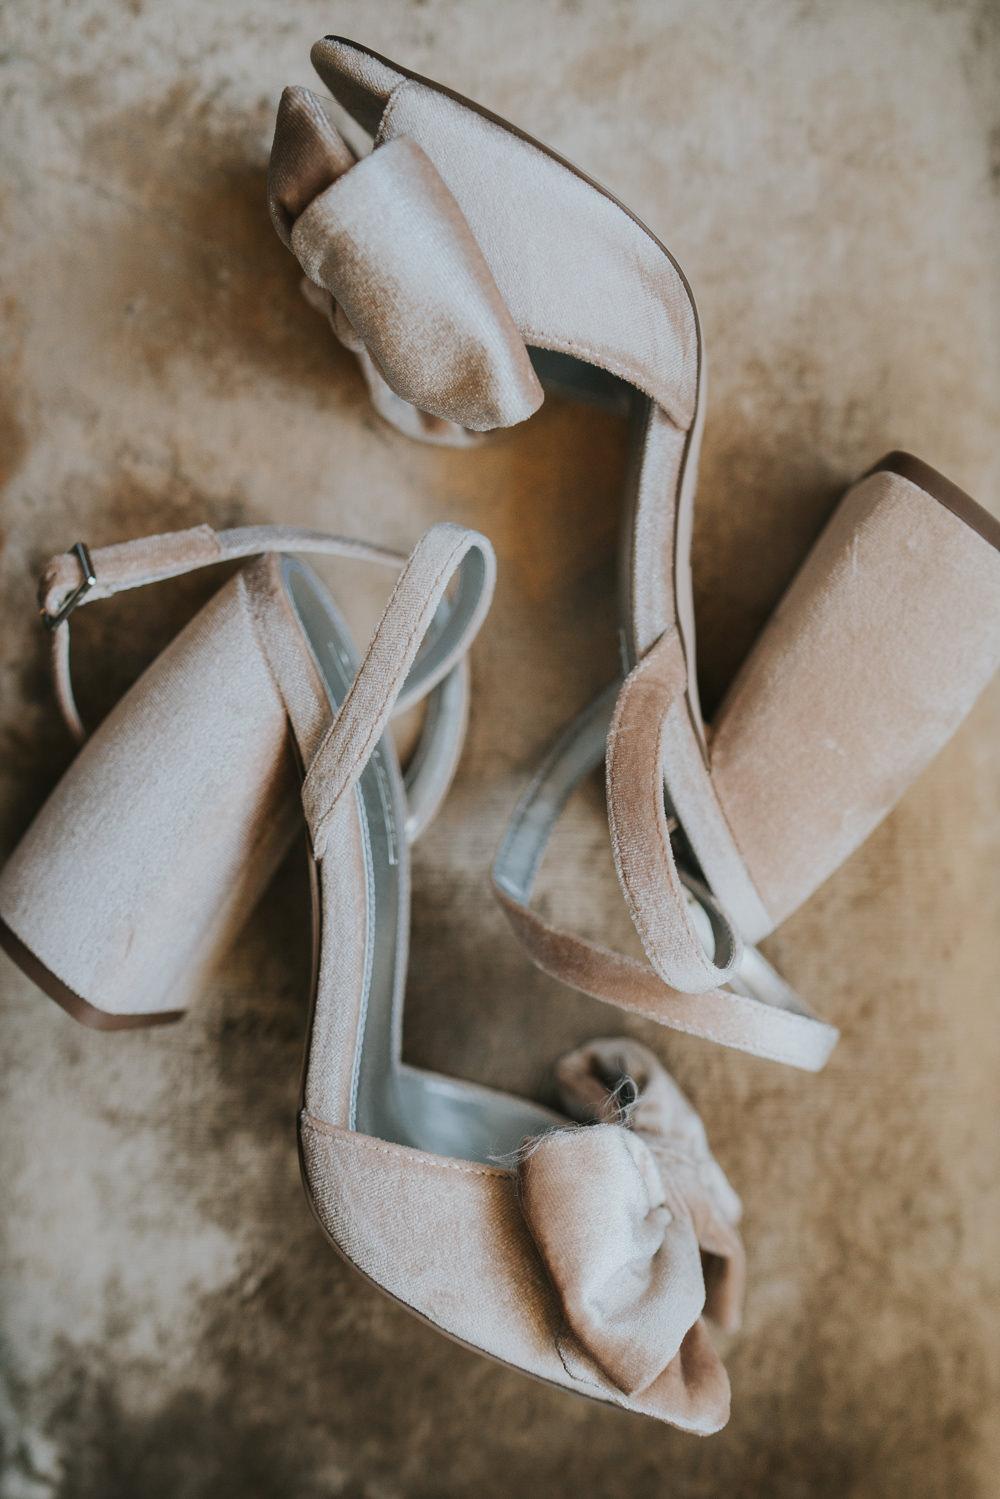 Outdoor Natural Relaxed Laid Back Summer White Dress Bridal Morning Prep Velvet Shoes | Prested Hall Wedding Grace Elizabeth Photography